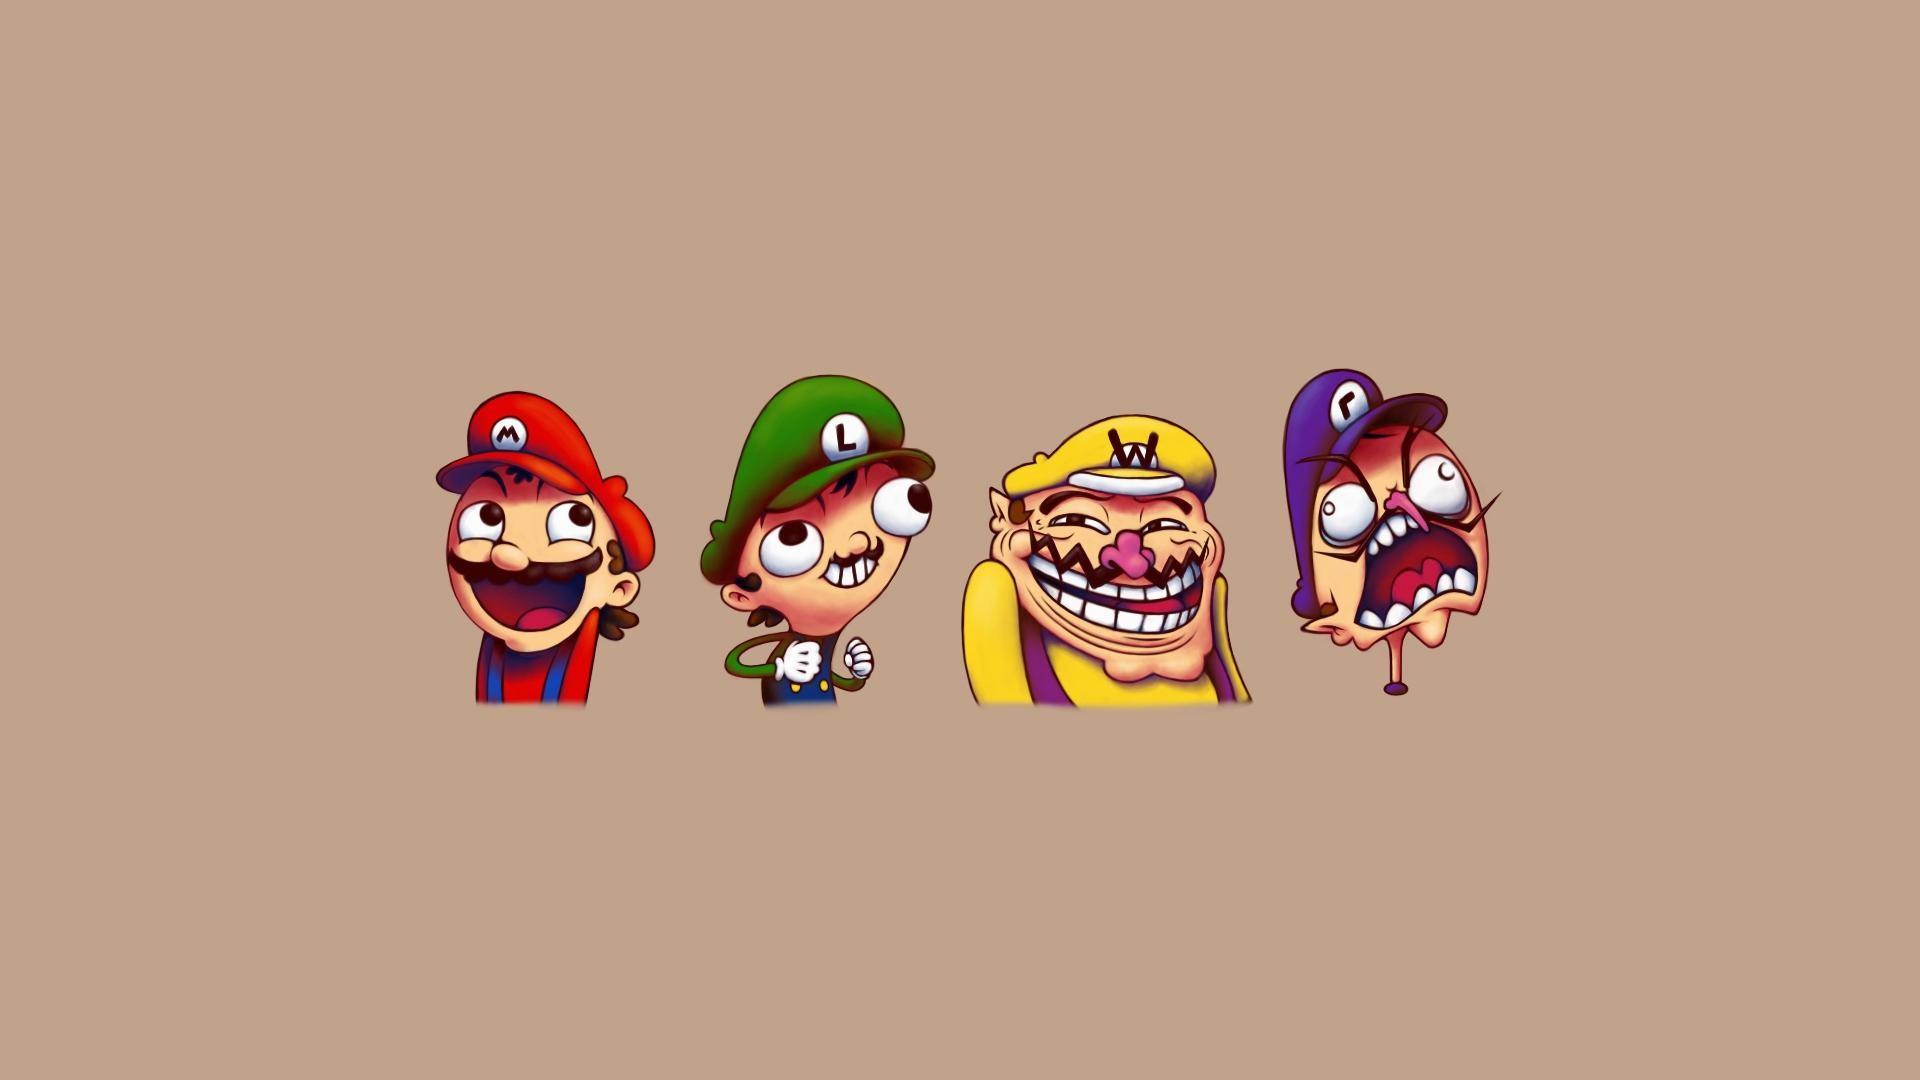 Wiki Meme Background Pic Wpe009348   Mario Memes   1920x1080 1920x1080